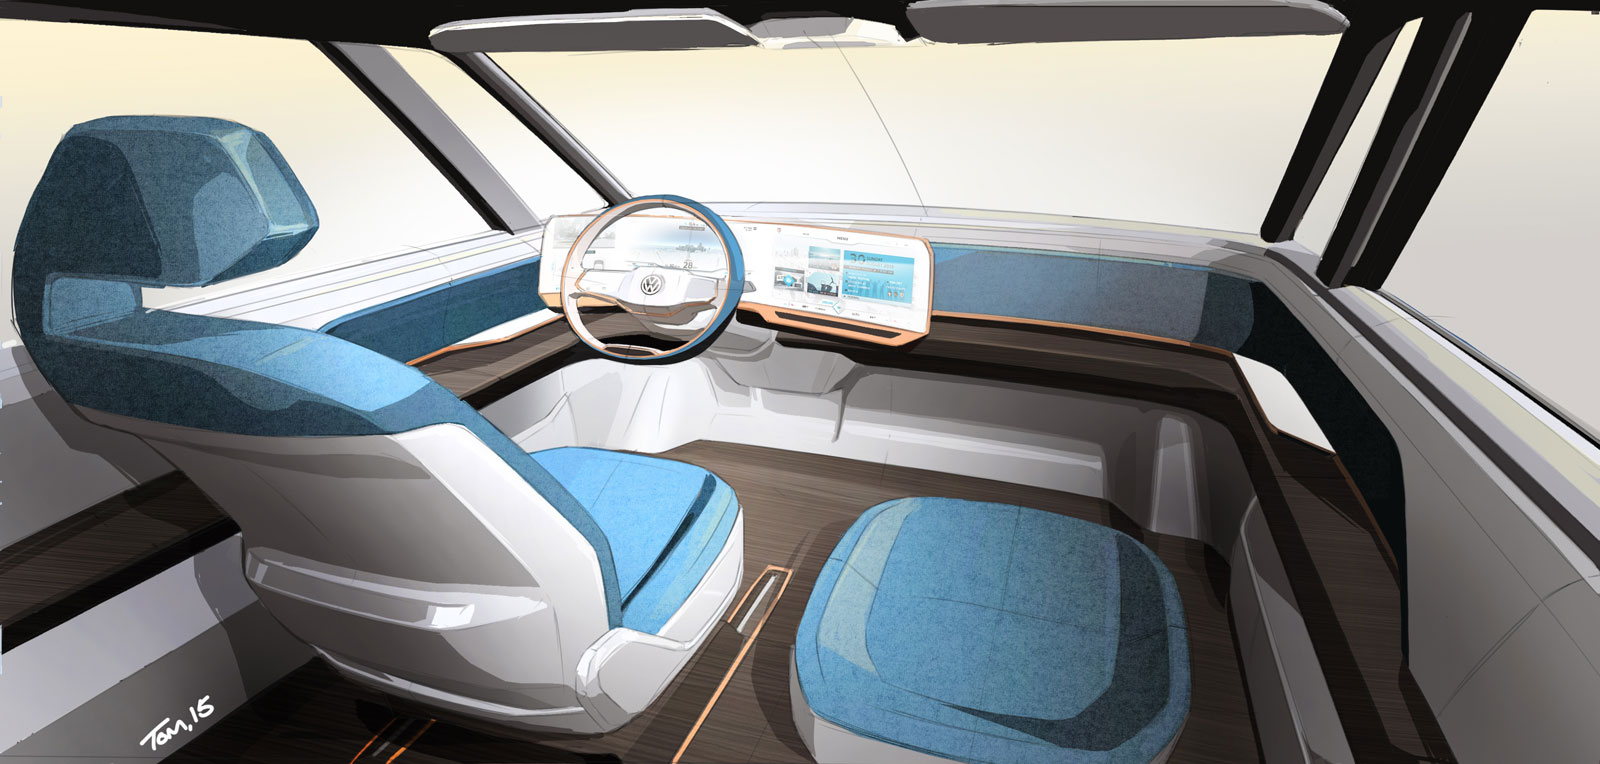 Volkswagen Budd E Concept Interior Design Sketch Render